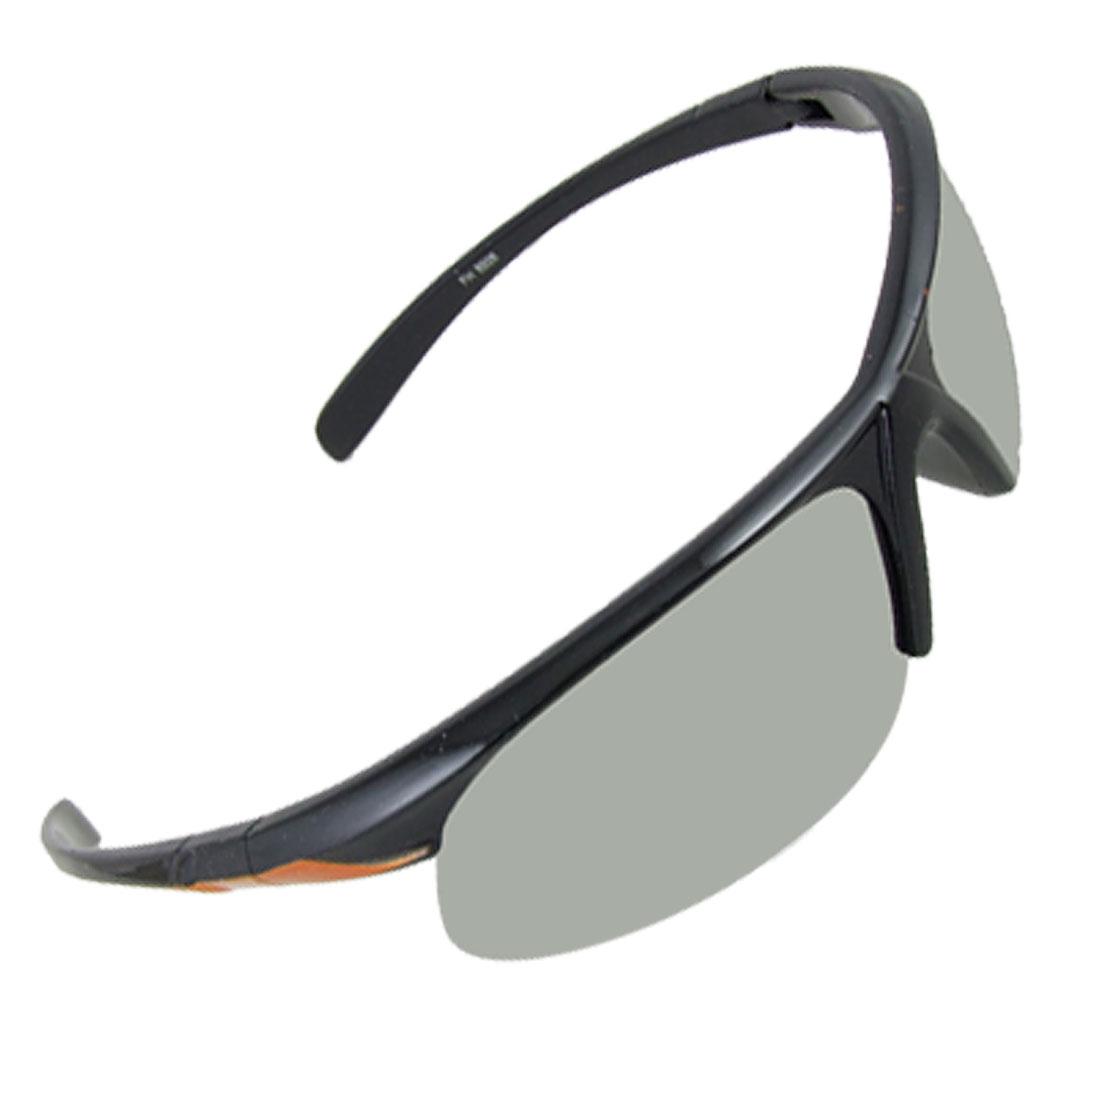 Mirror Lens Semi Frame Black Orange Arms Sports Sunglasses